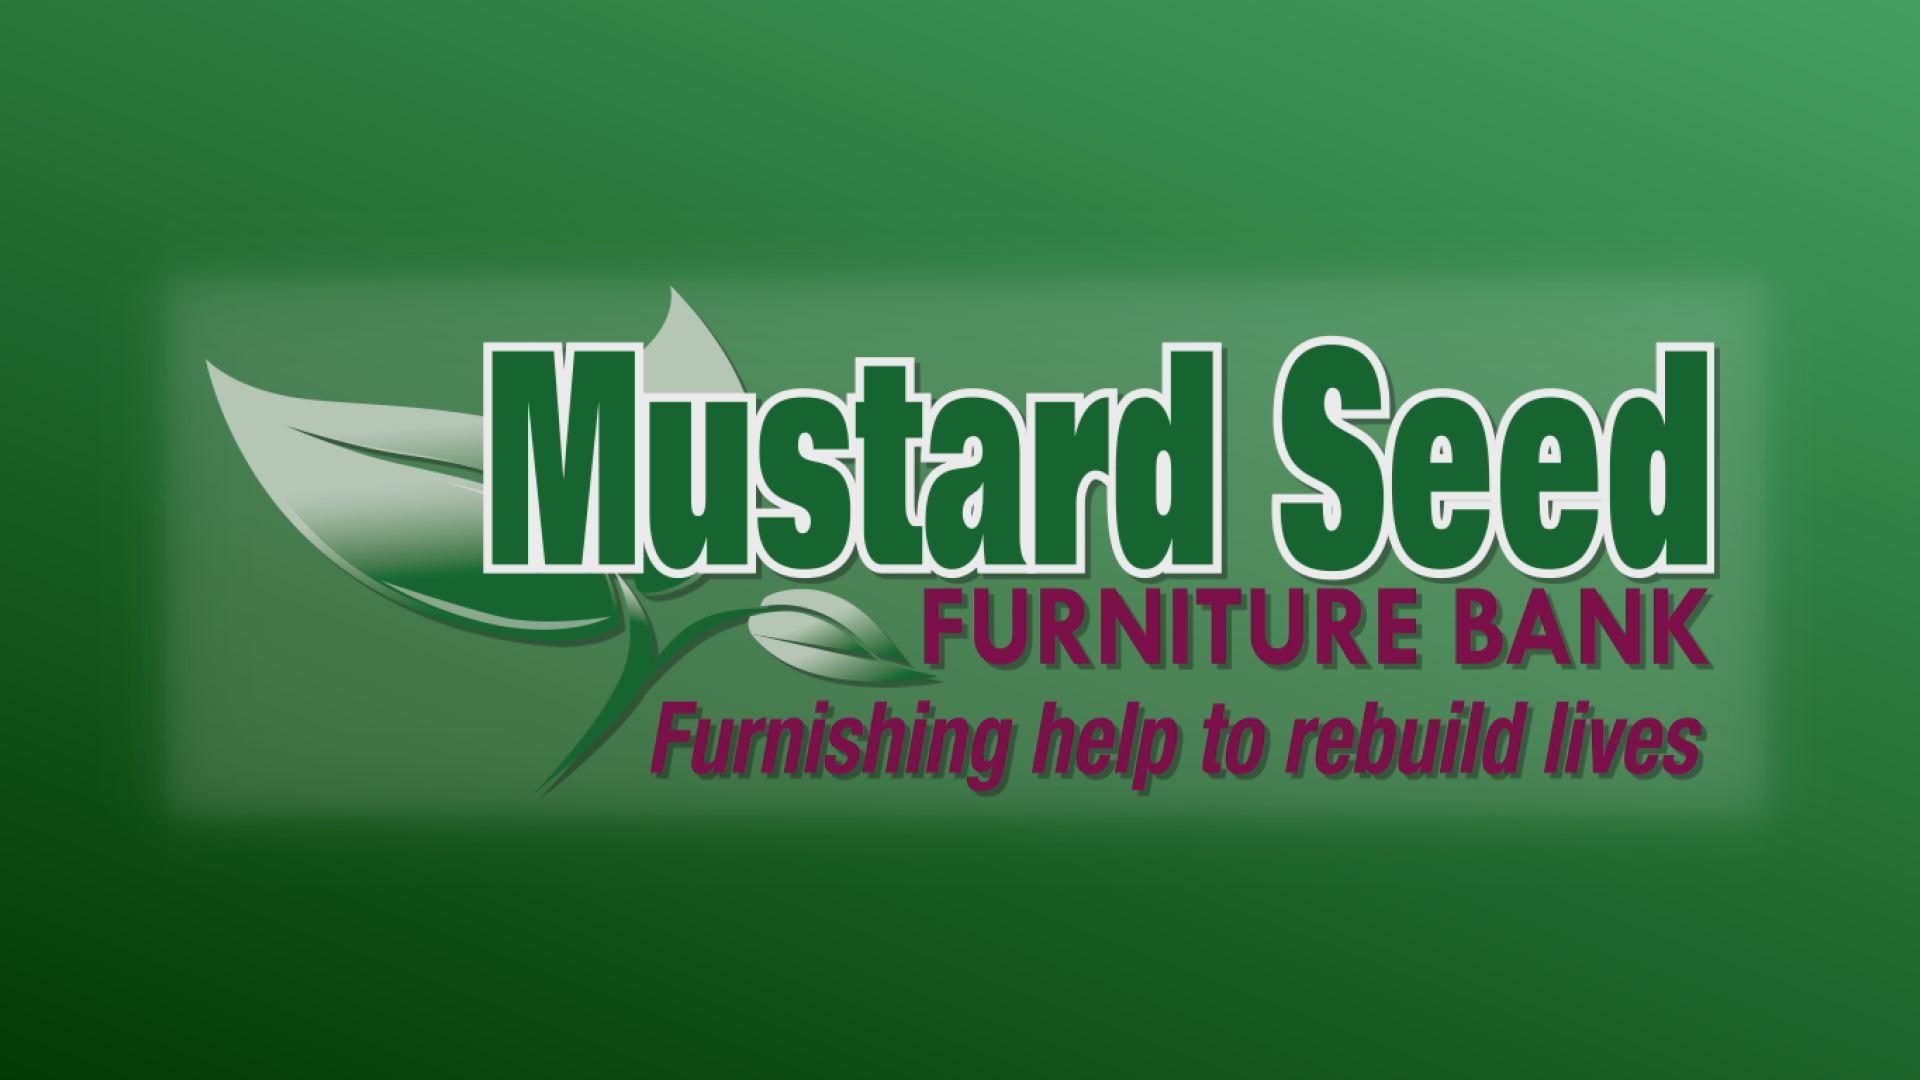 Mustard Seed _2015 logo00000000_136028